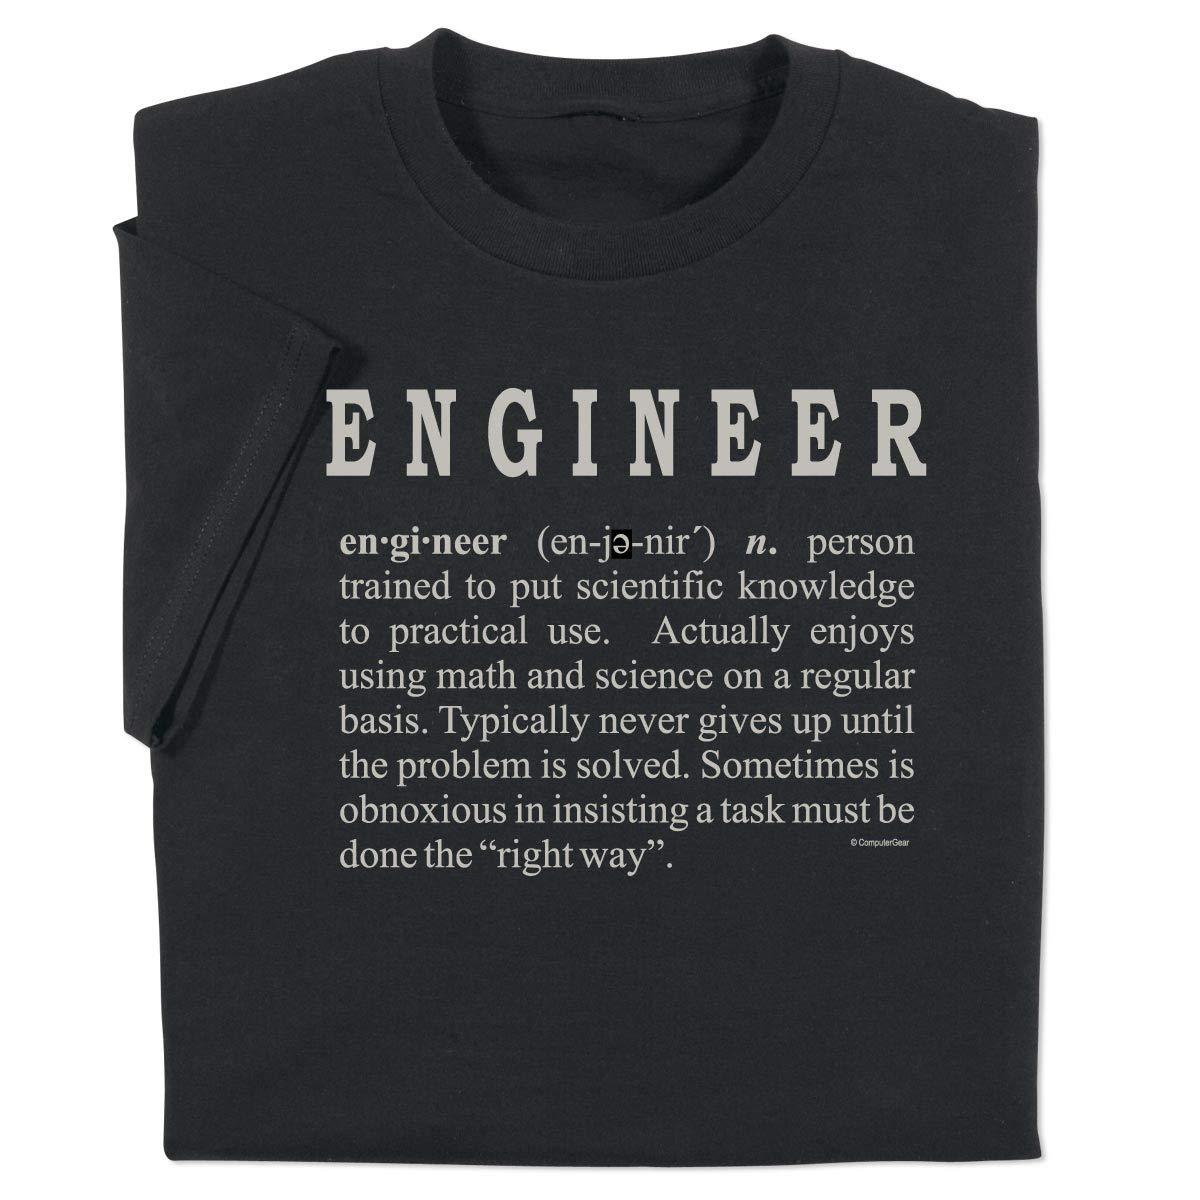 639fe64301 Amazon.com: ComputerGear Funny Engineering T Shirt Engineer Definition Geek  Nerd Adult Tee: Clothing